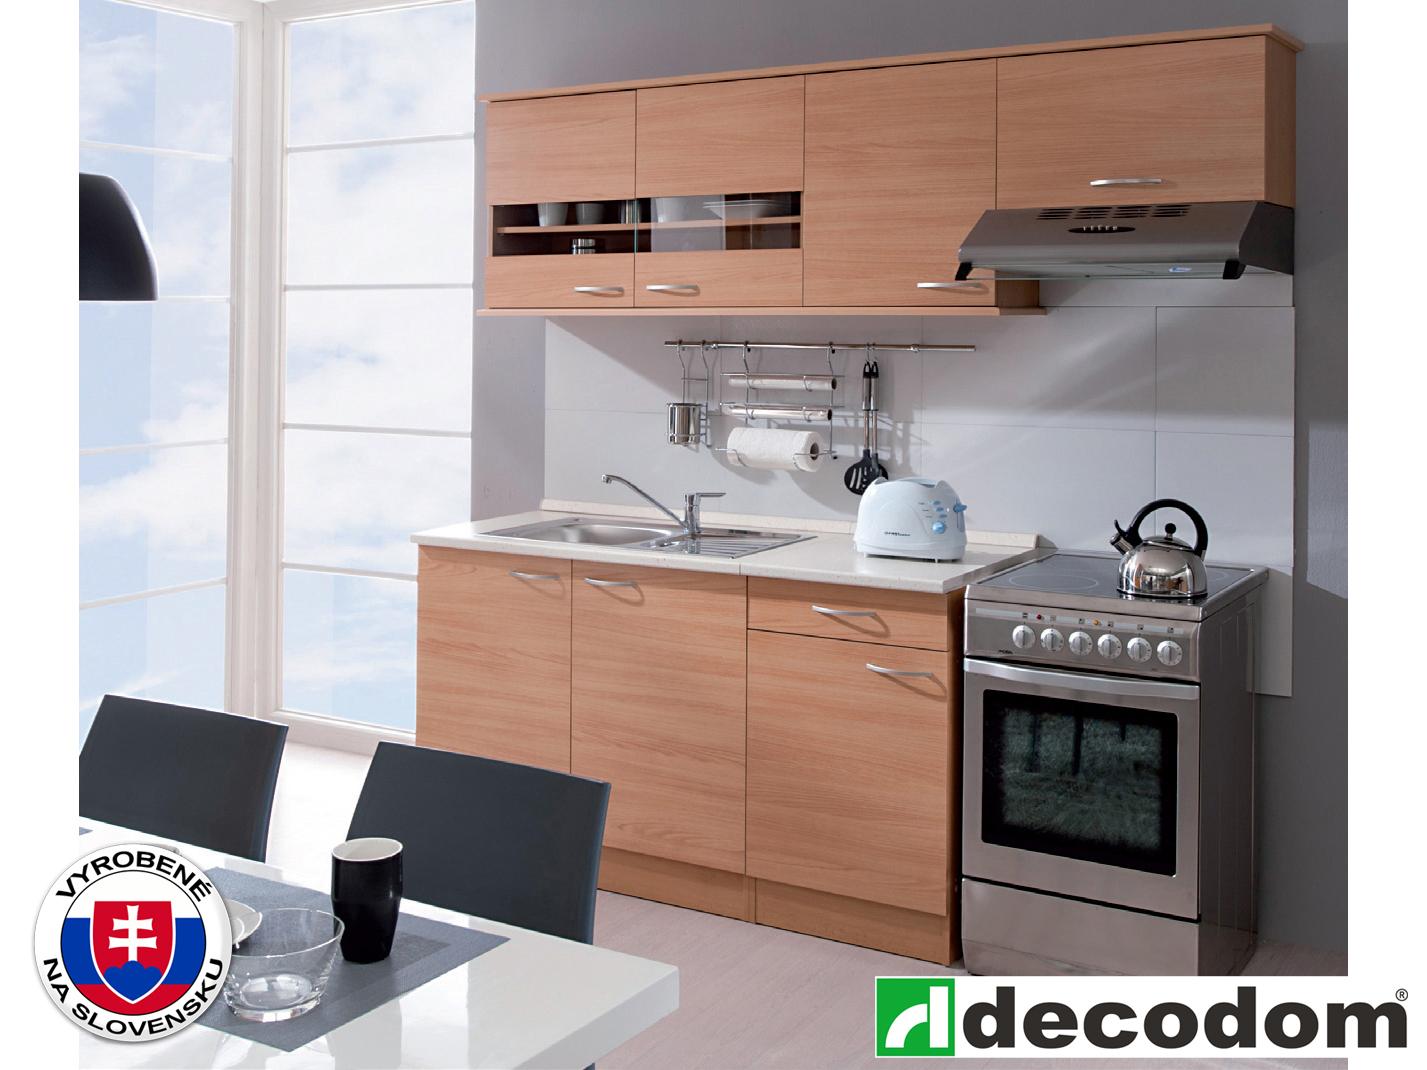 Kuchyňa - Decodom - Nela 210 cm - PD 50+100 buk